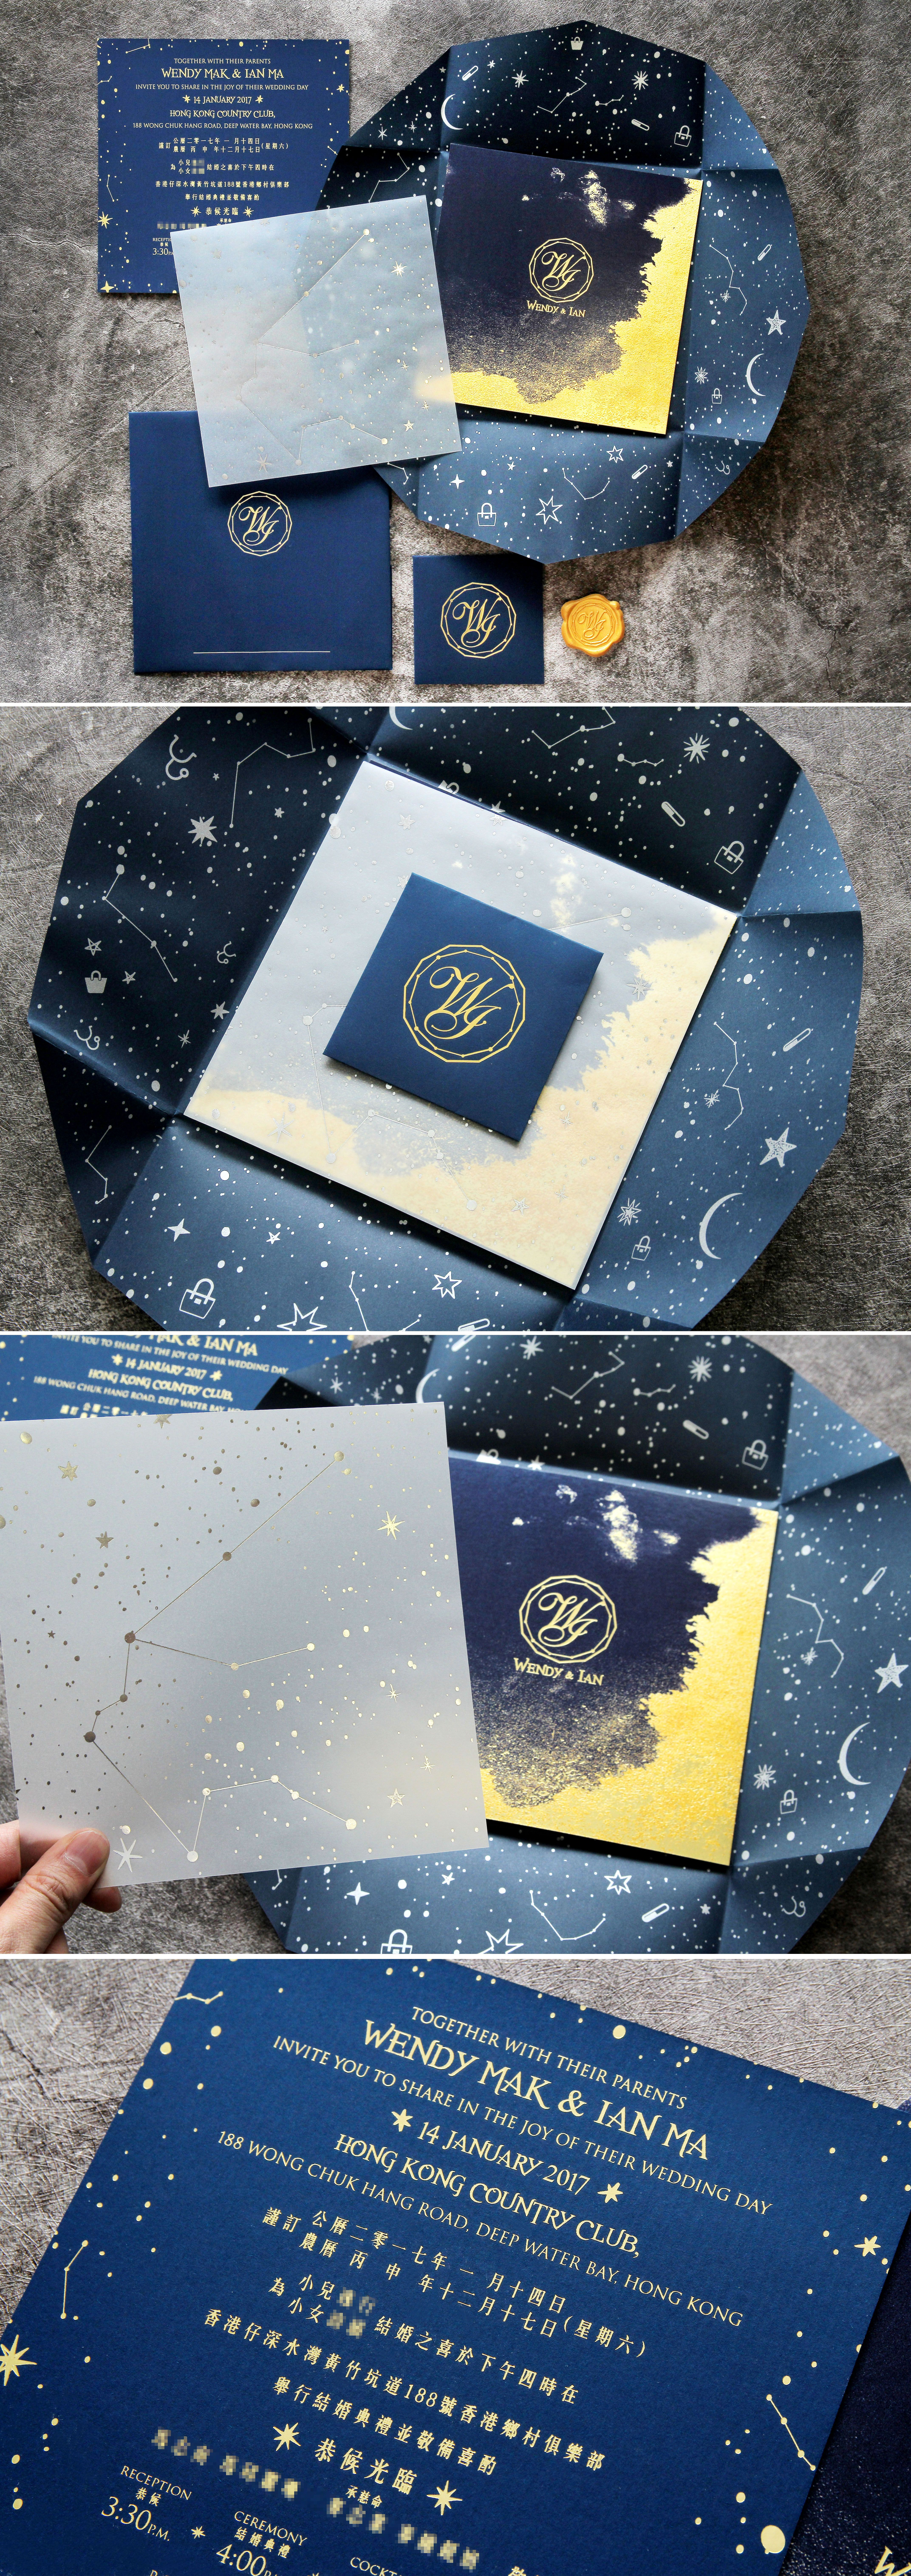 Constellation wedding invitation card design wedding constellation wedding invitation card design wedding weddingcard invitation stopboris Choice Image